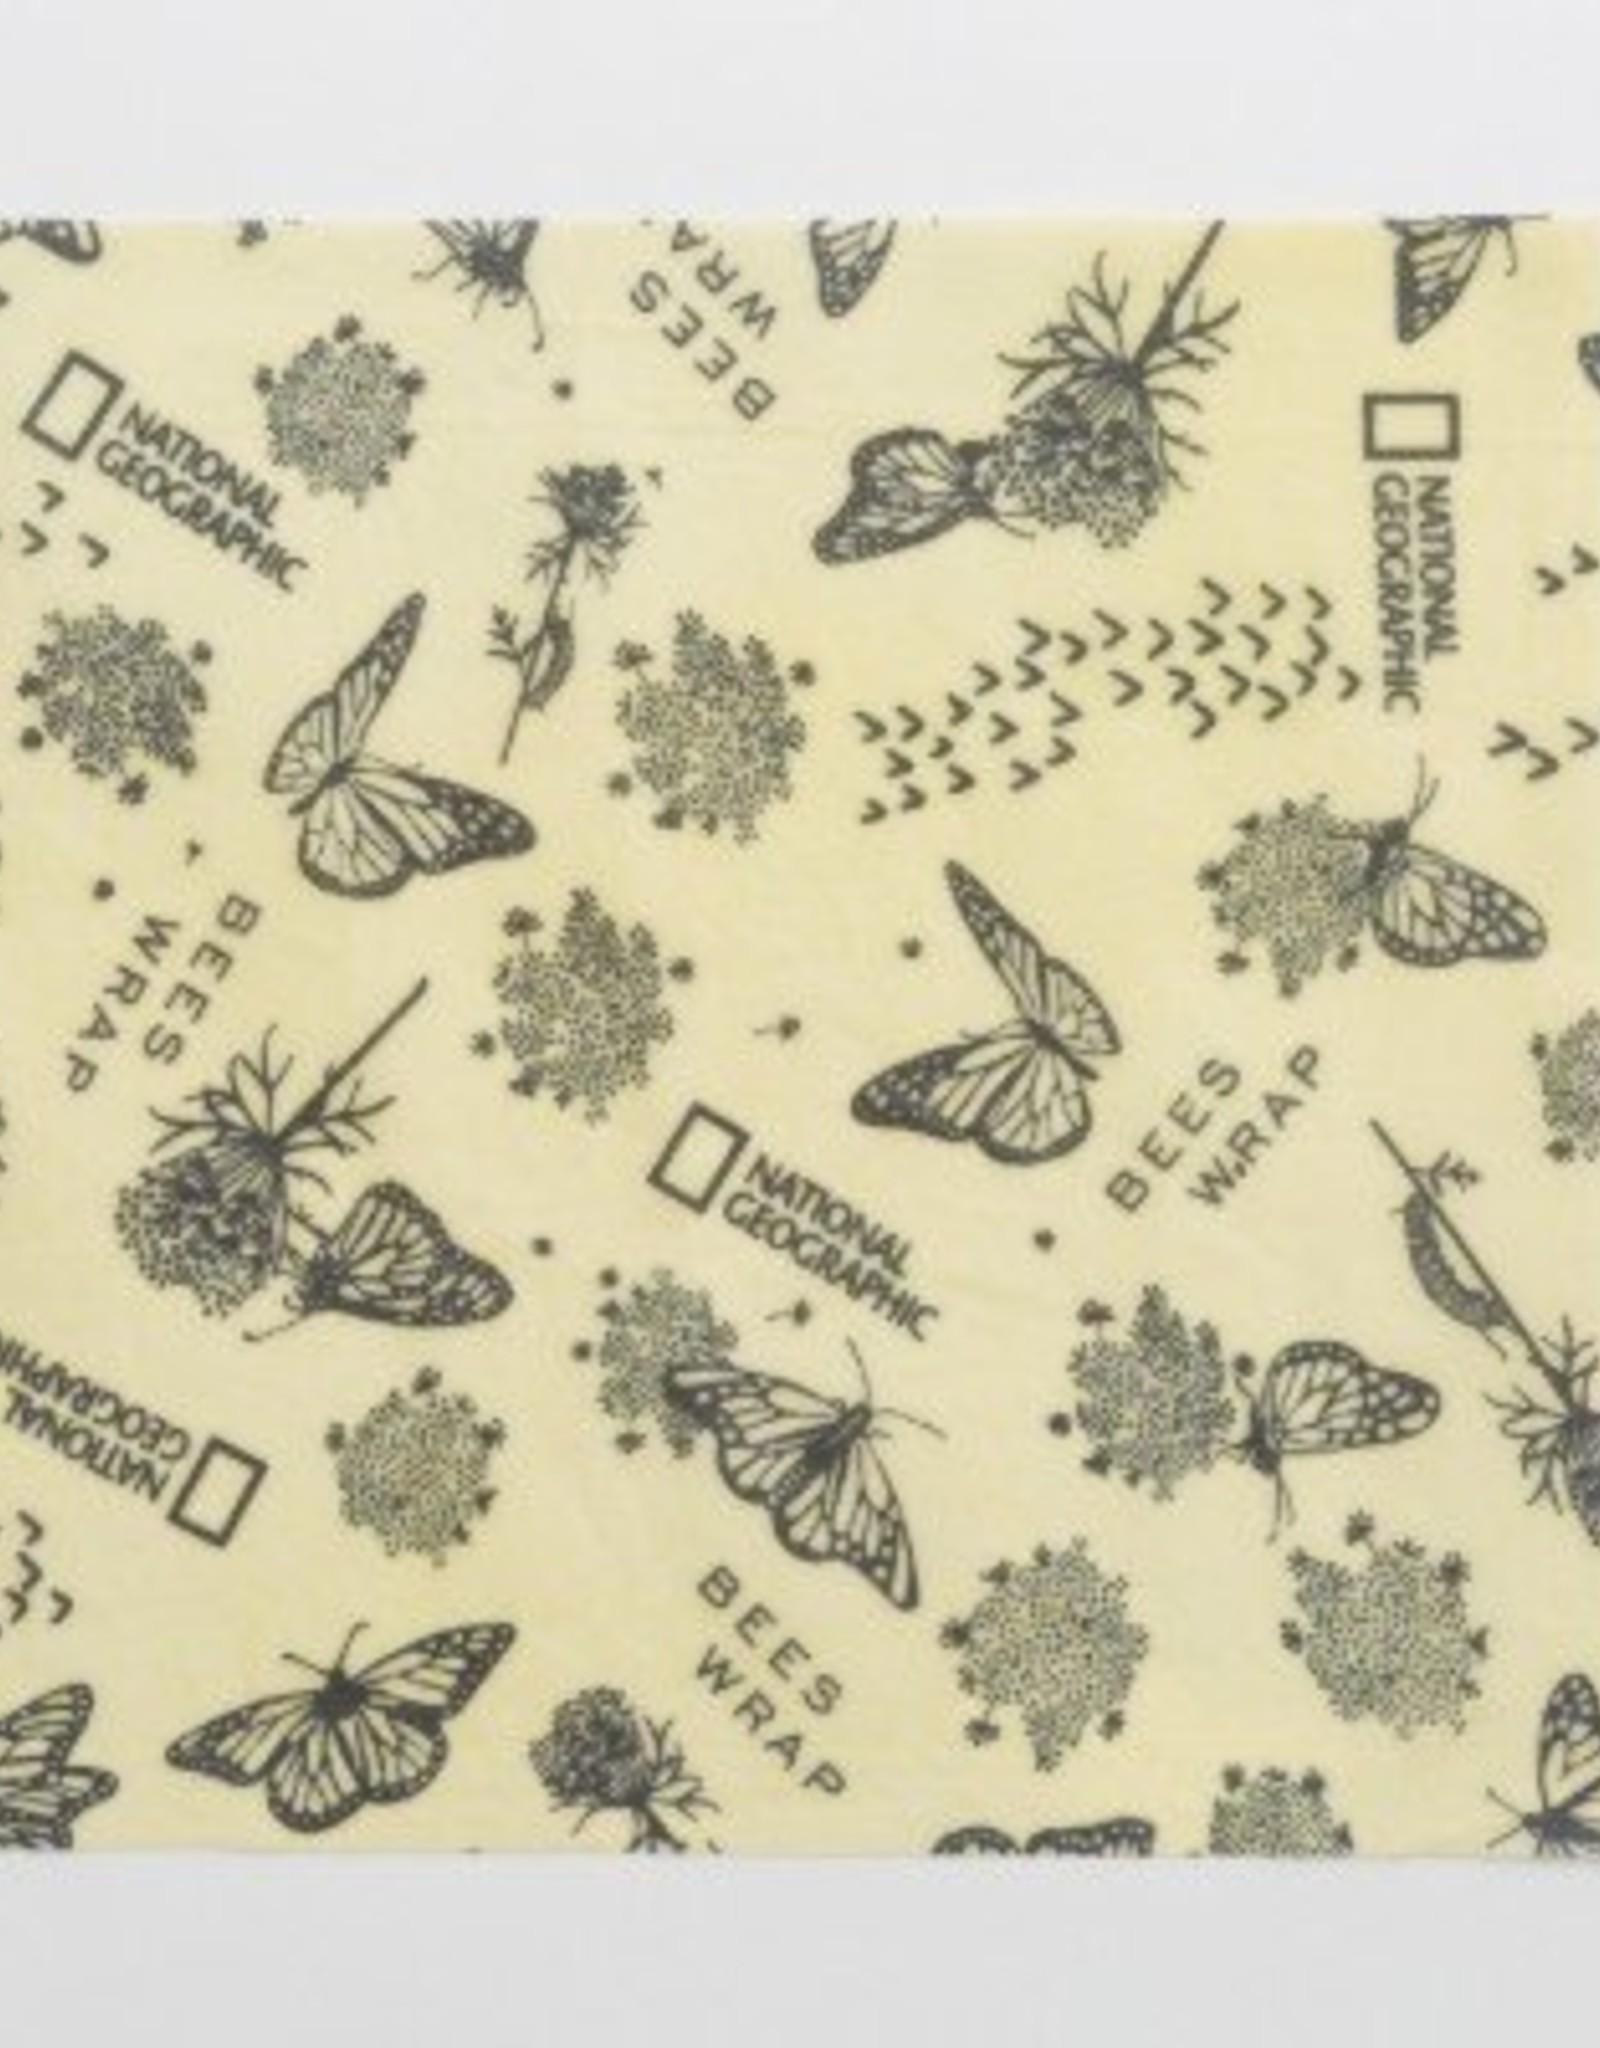 Bee's Wrap Explorer Pack- 2 Medium, 1 Sandwich Wrap- Monarch Print